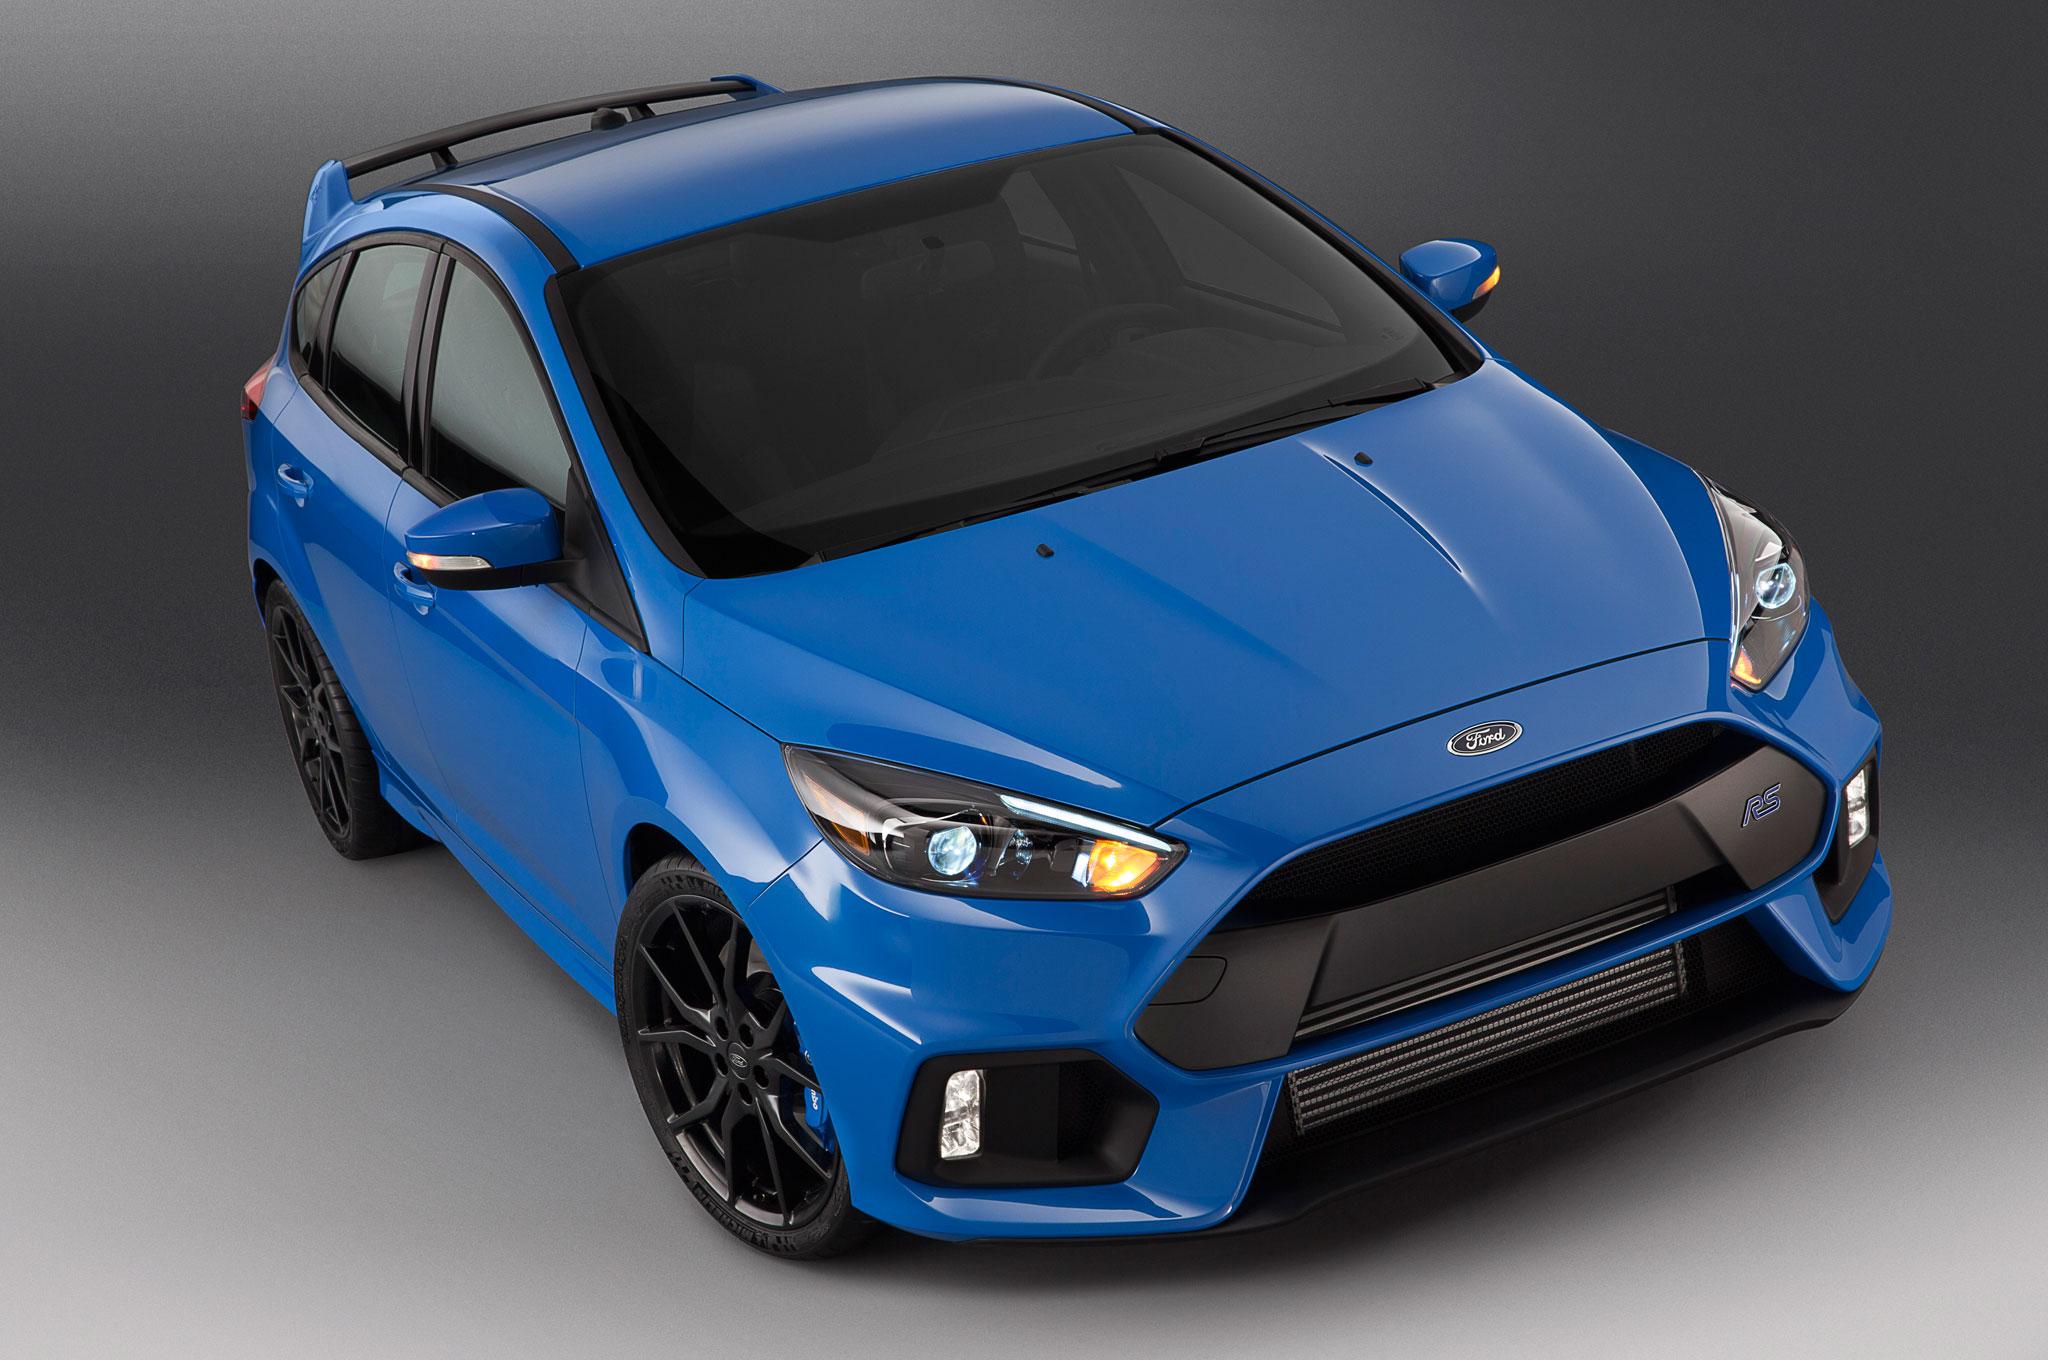 Ford Focus RS 2016 podría costar $36,605